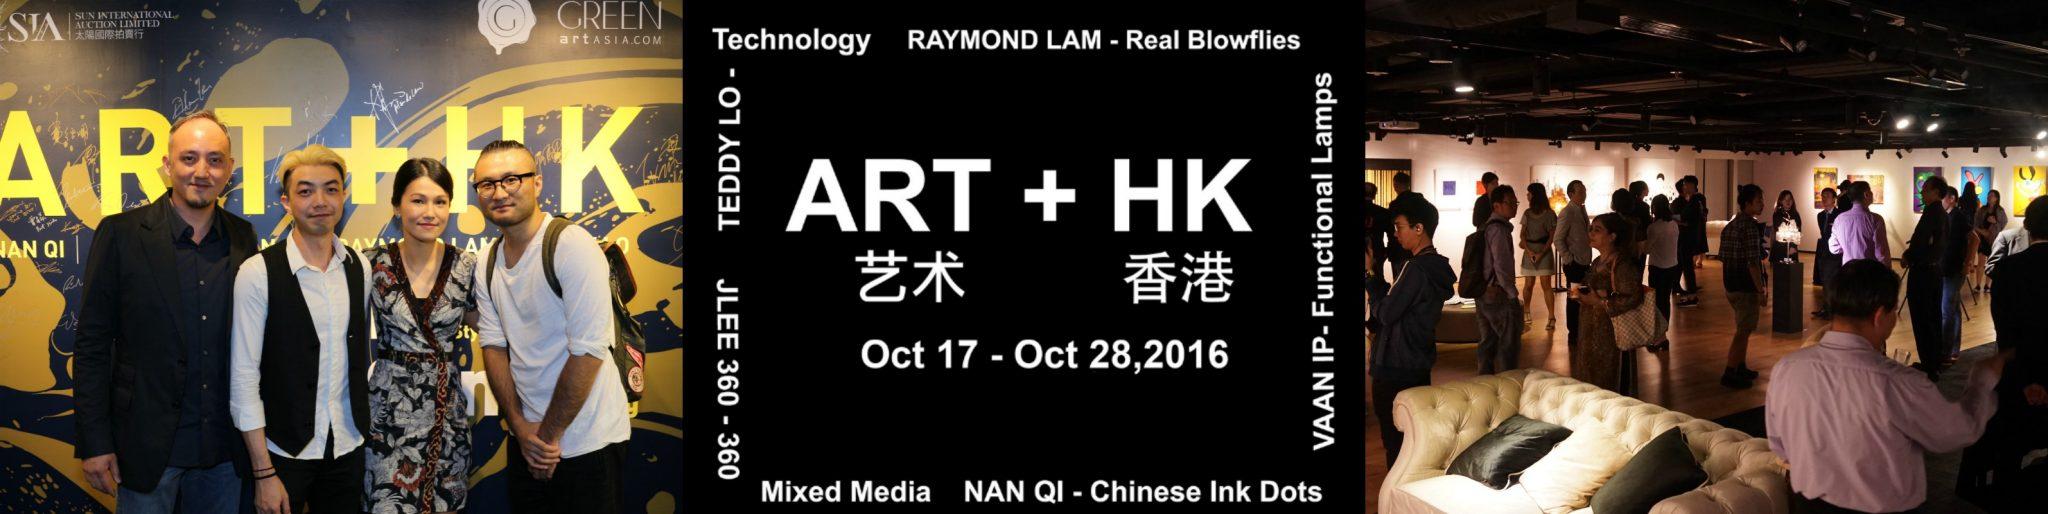 art-hk-1